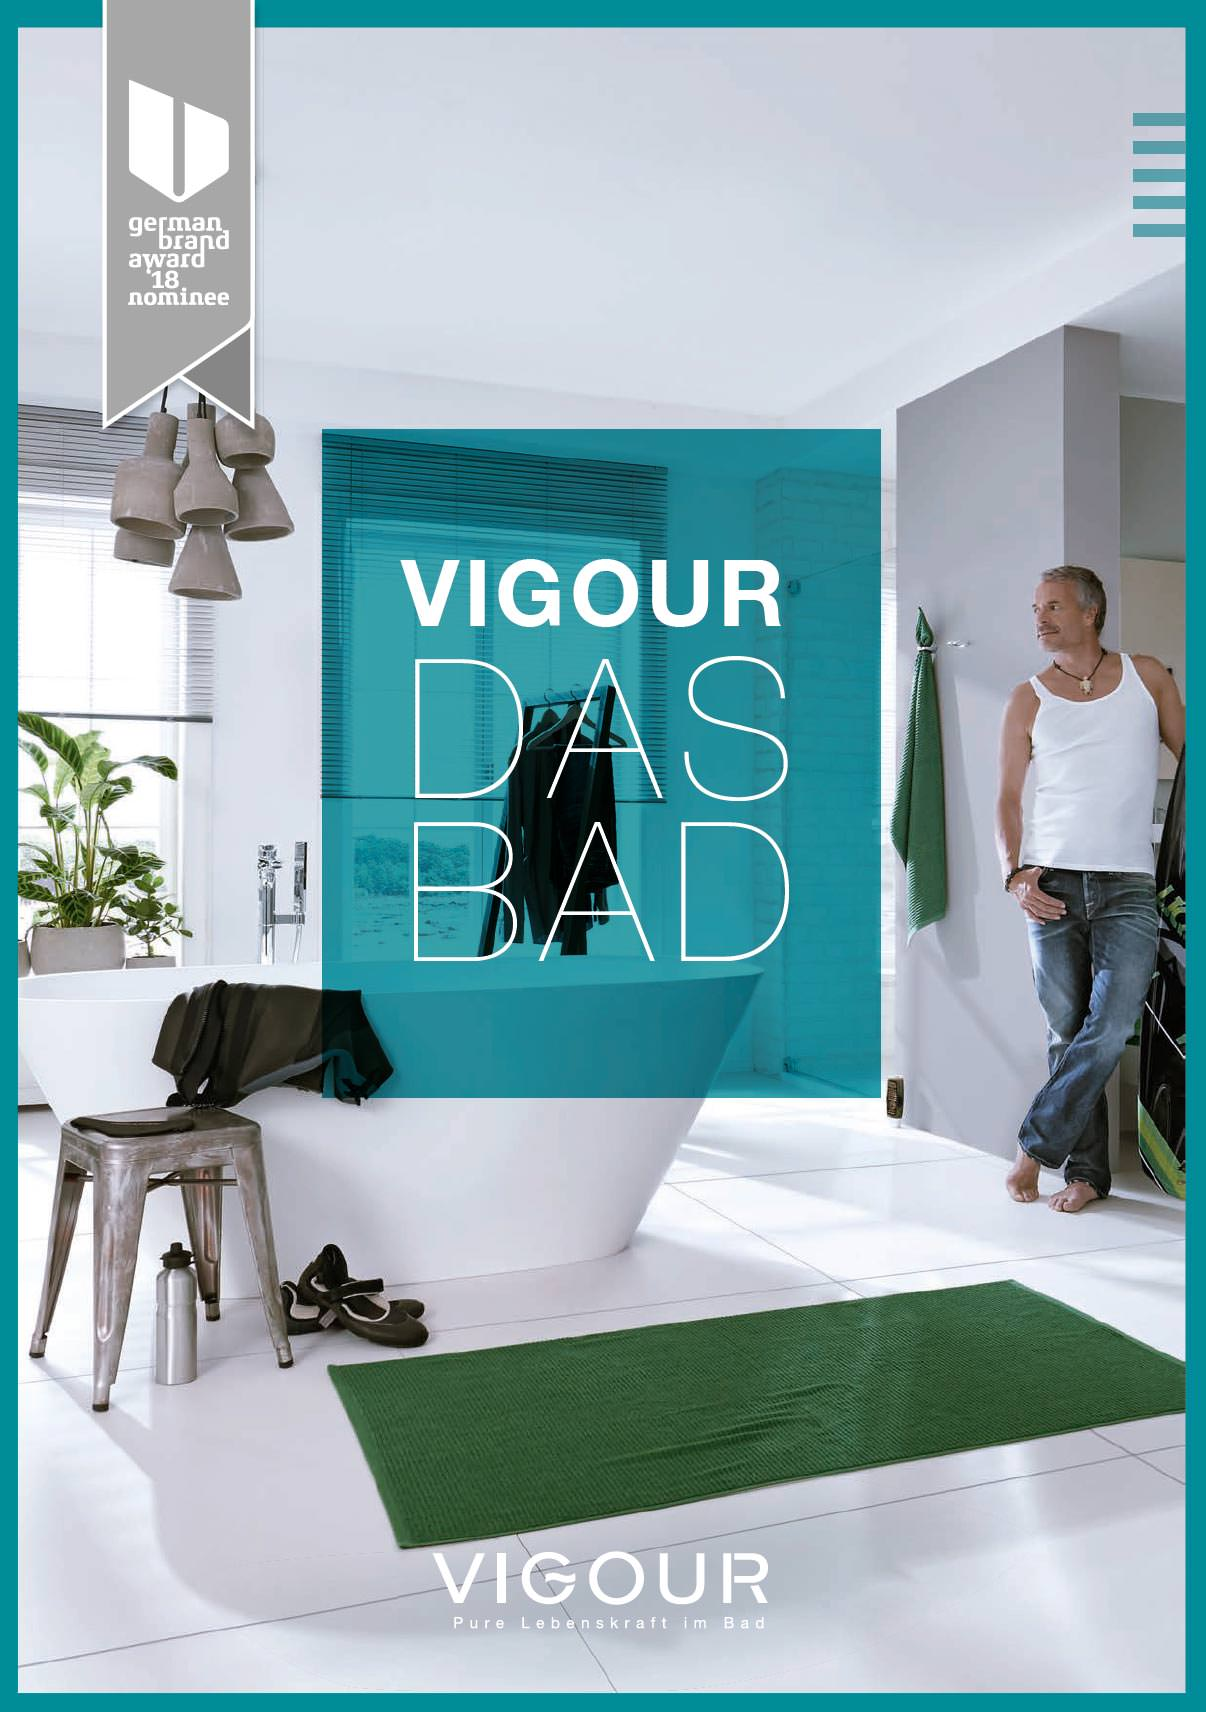 336 Seiten Badezimmer im neuen Vigour-Katalog